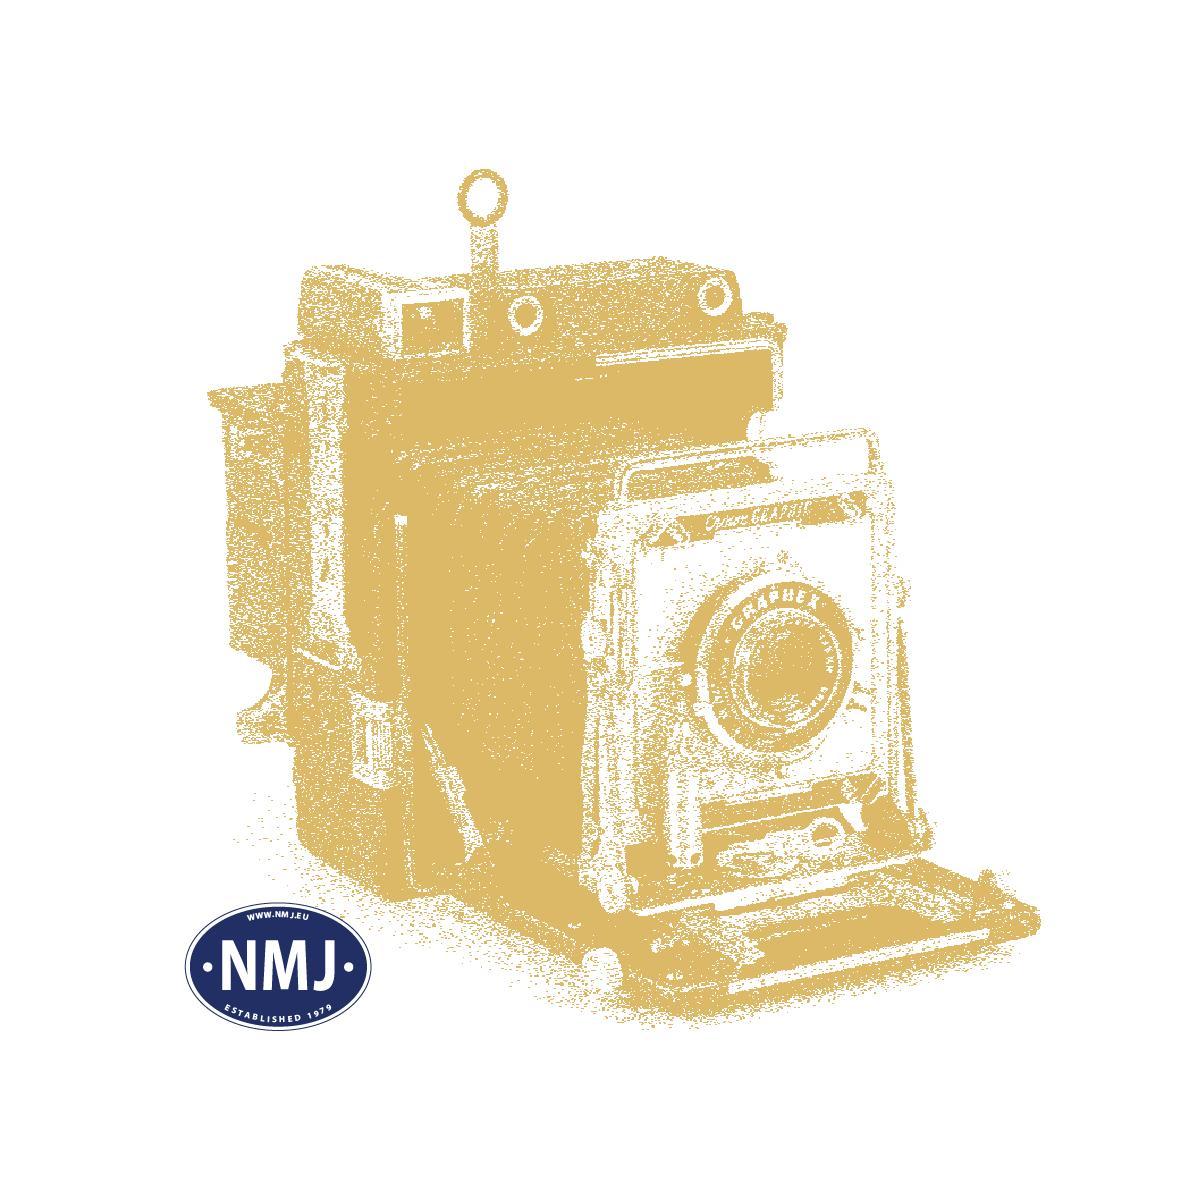 NMJT145002 - NMJ Topline NSB Di3.623 Gammeldesign (rotbraun), Spur 0